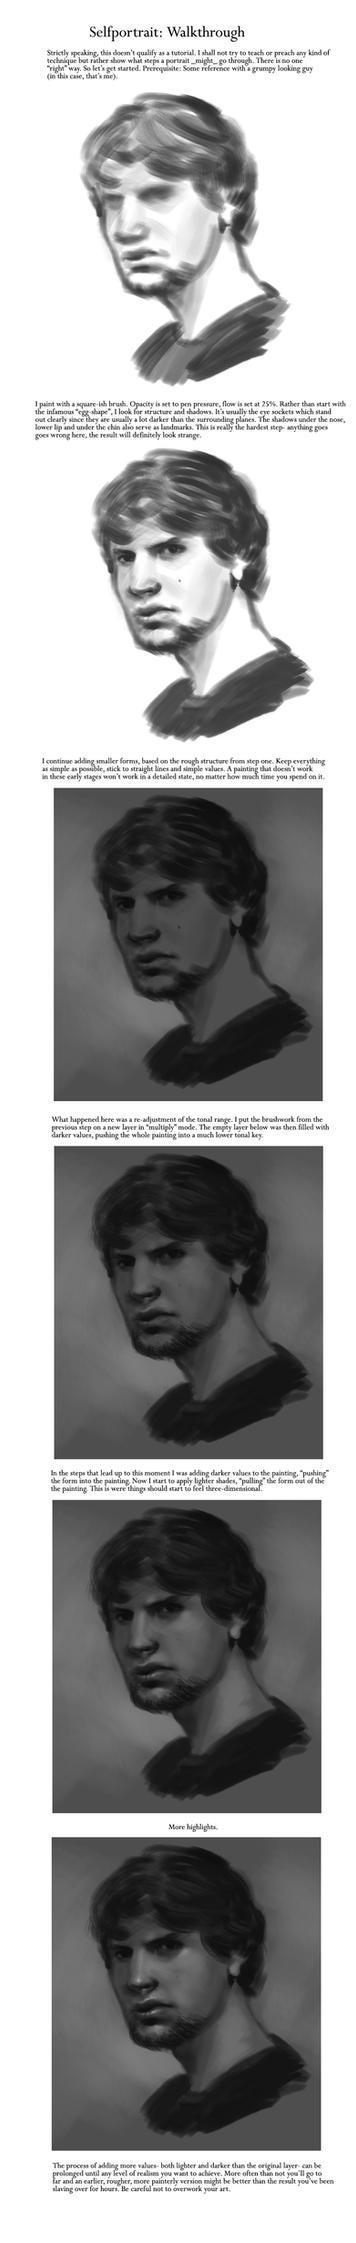 Selfportrait: A Walkthrough by ReneAigner